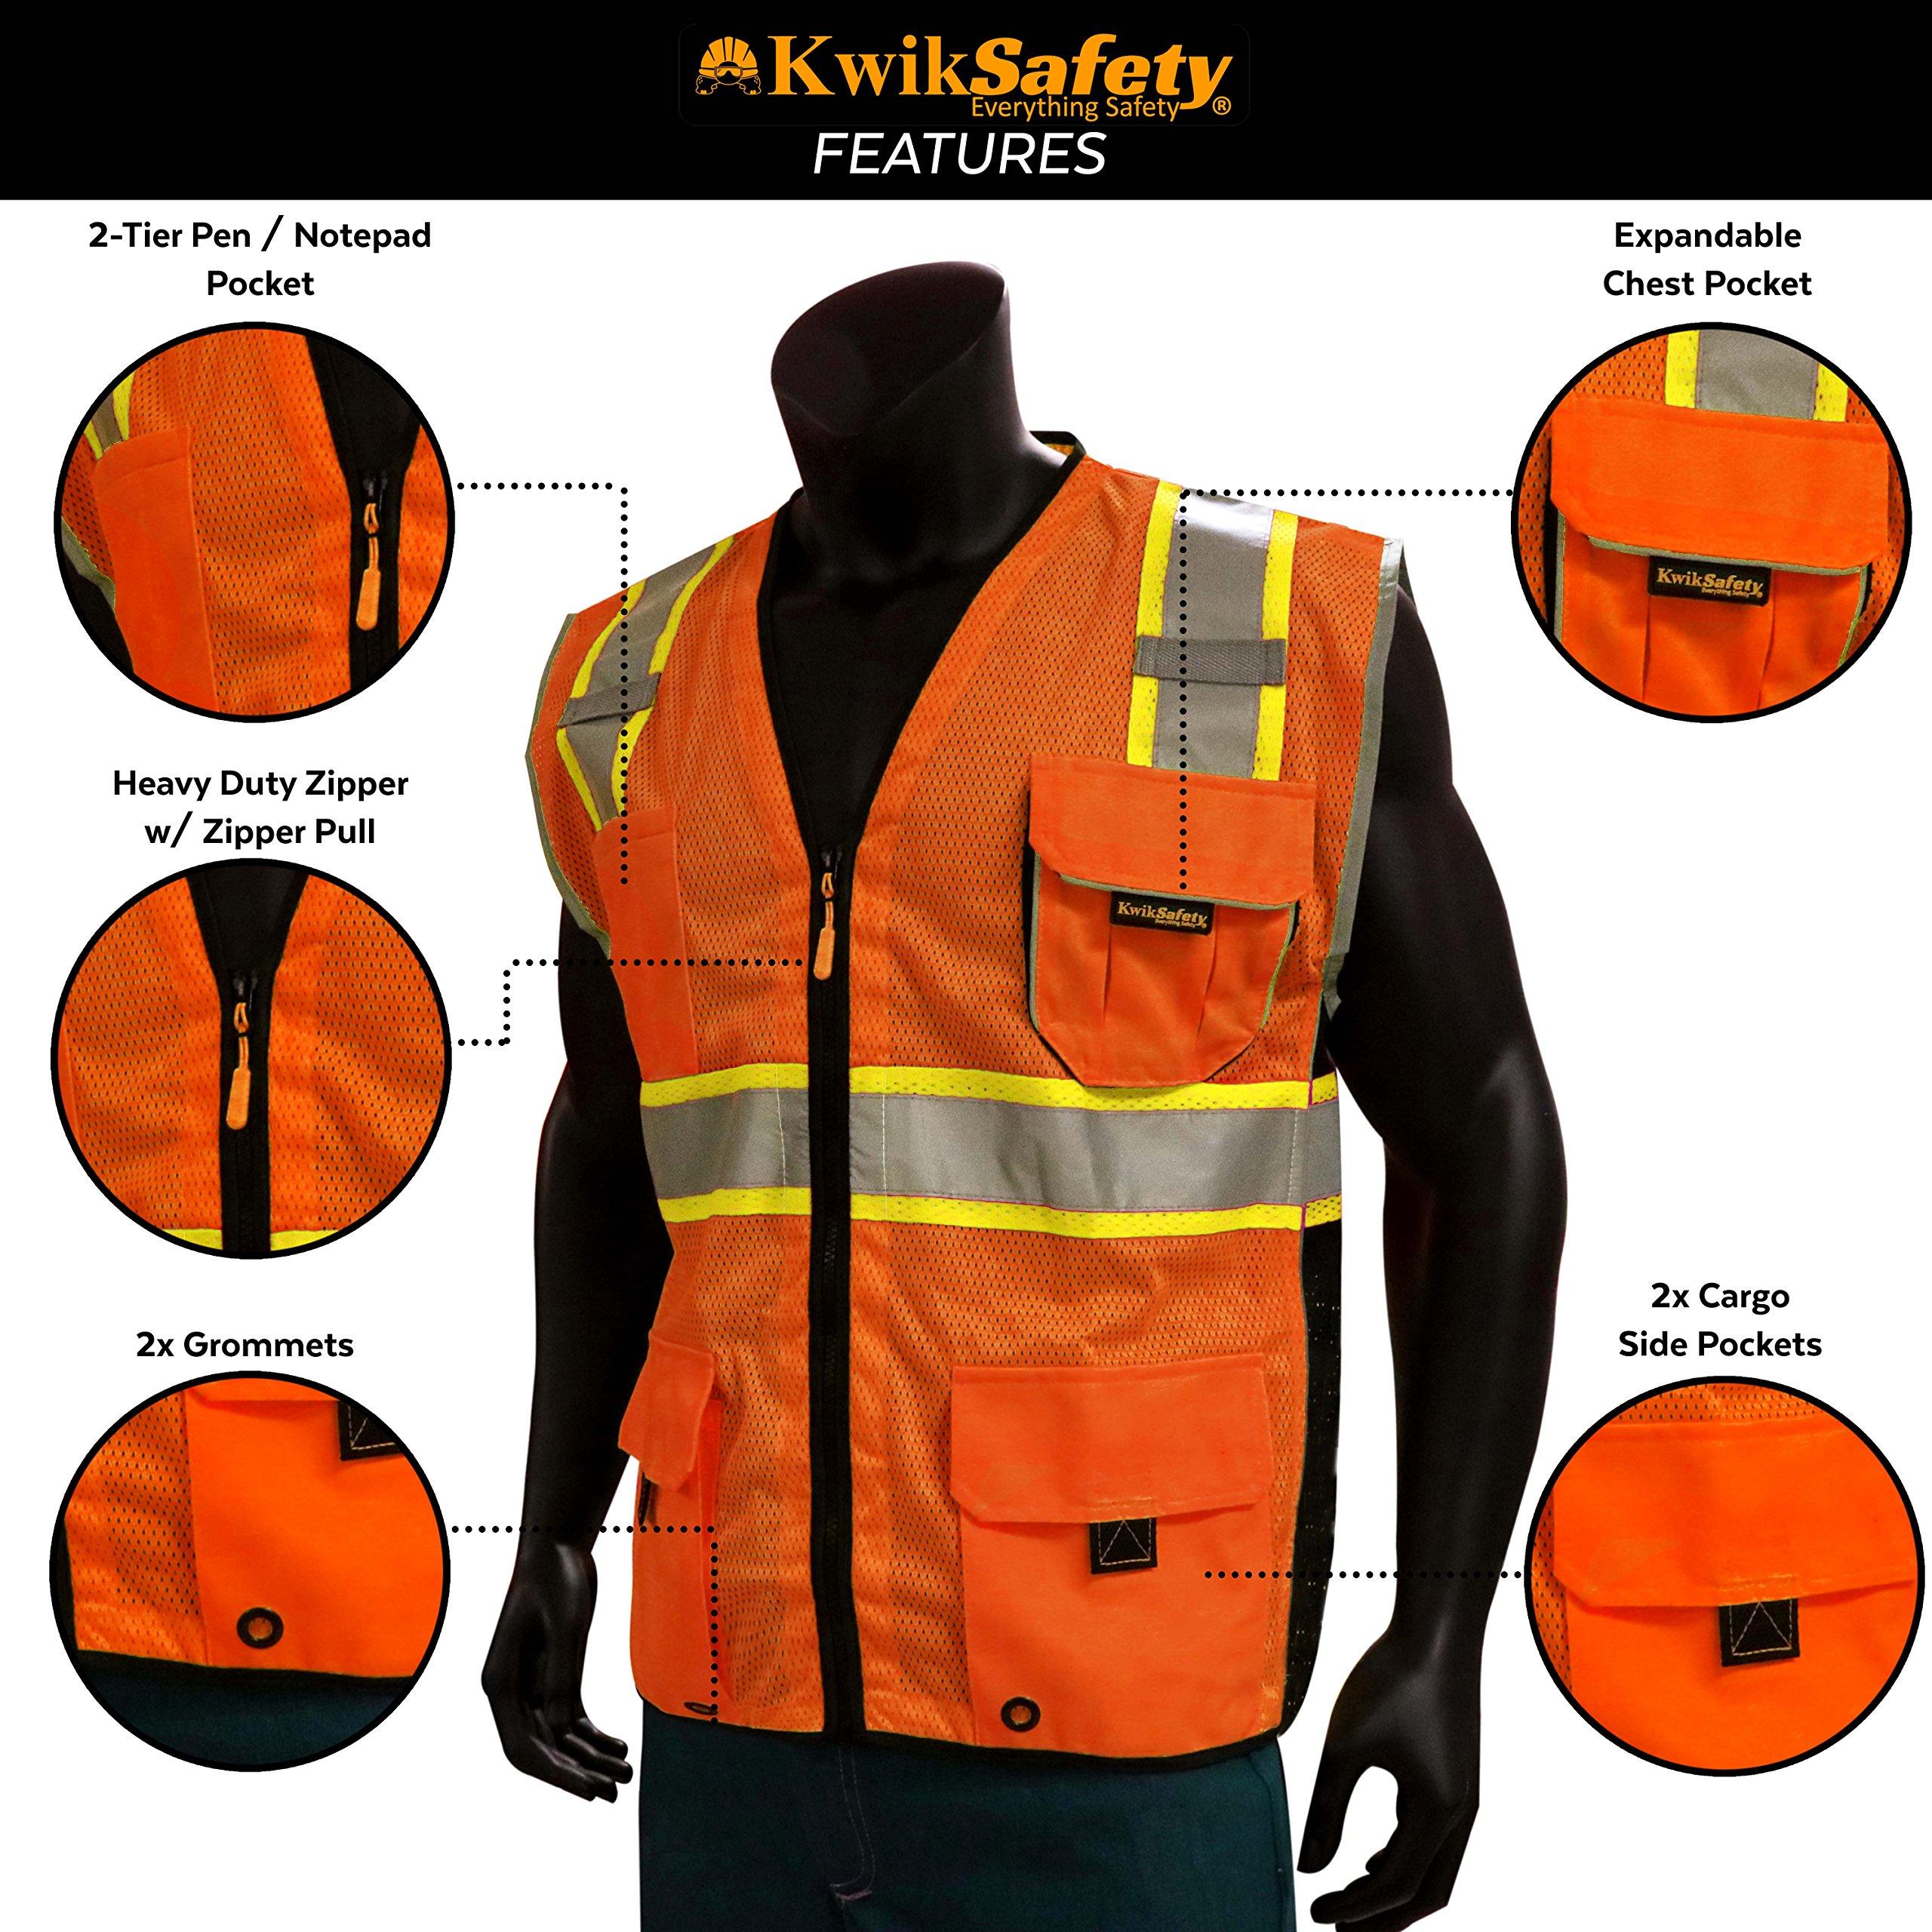 KwikSafety CLASSIC Safety Vest | Class 2 ANSI OSHA PPE | High Visibility Reflective Stripes, Heavy Duty Mesh with Pockets and Zipper | Hi-Vis Construction Work Hi-Vis Surveyor | Orange S/M by KwikSafety (Image #5)